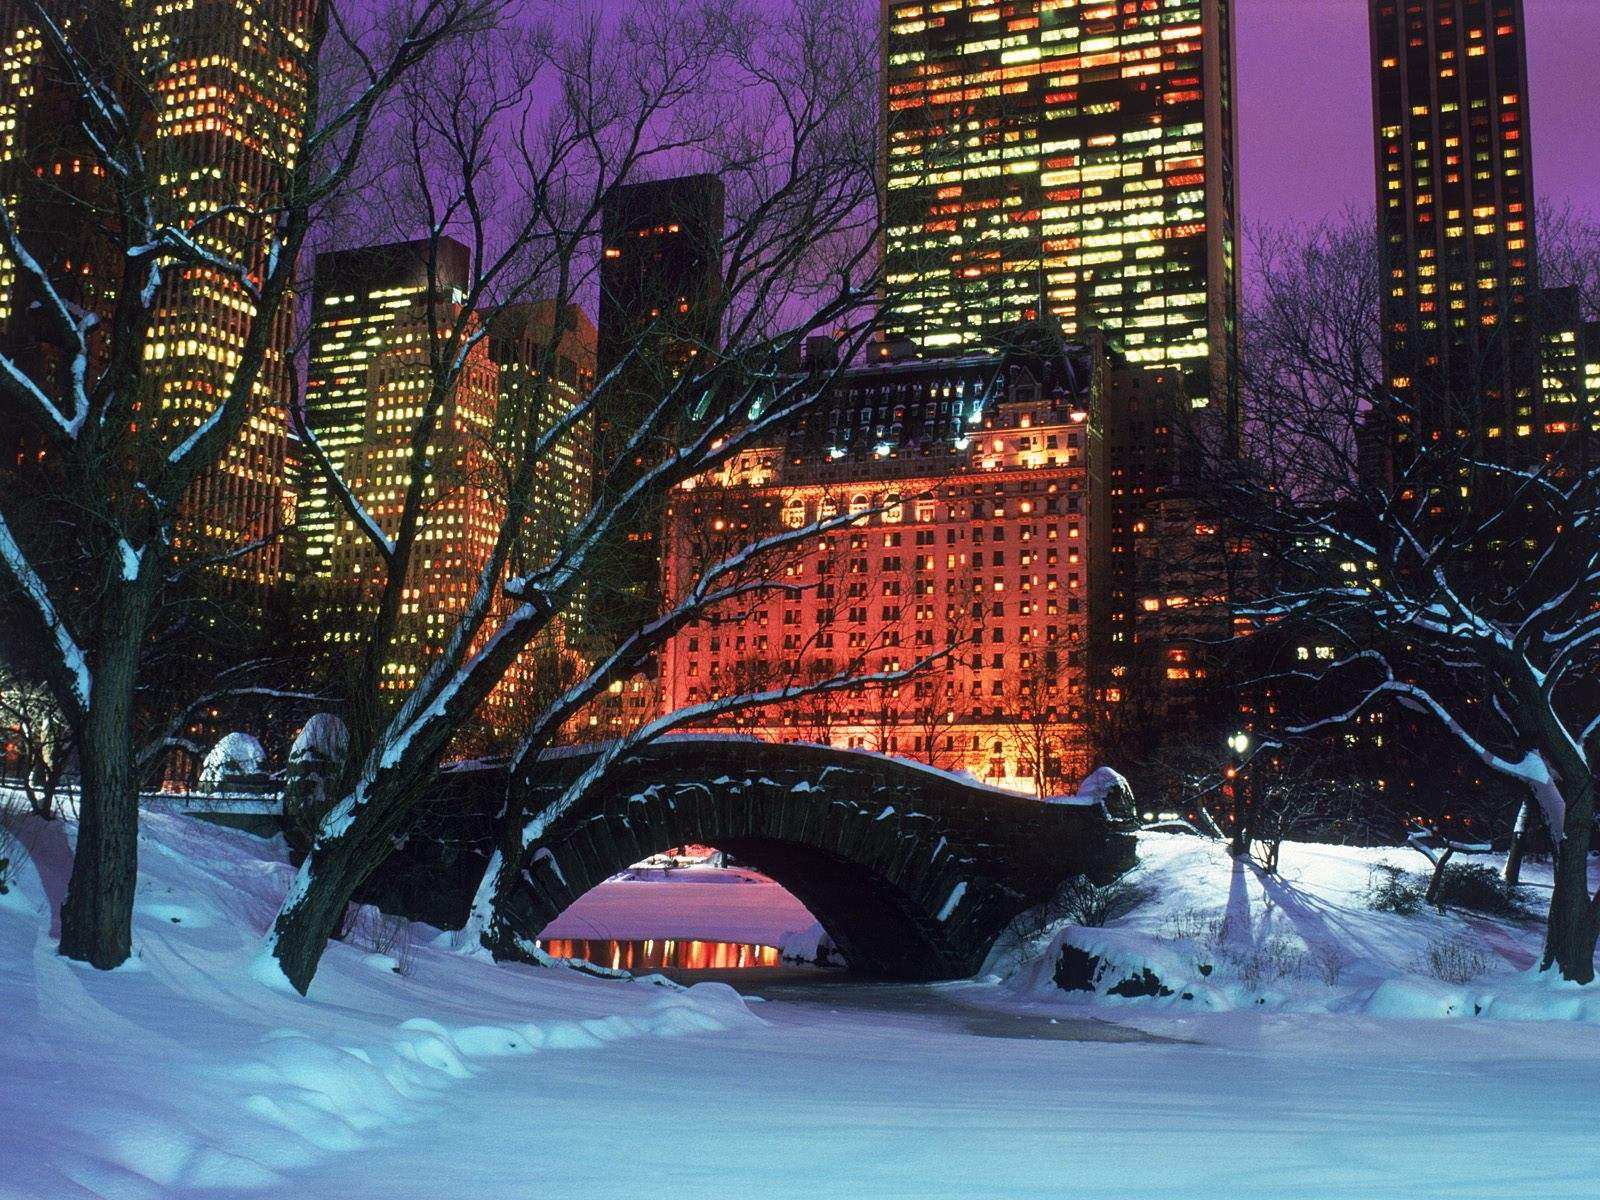 Download Snow Park New York Widescreen Christmas Wallpaper 1600x1200